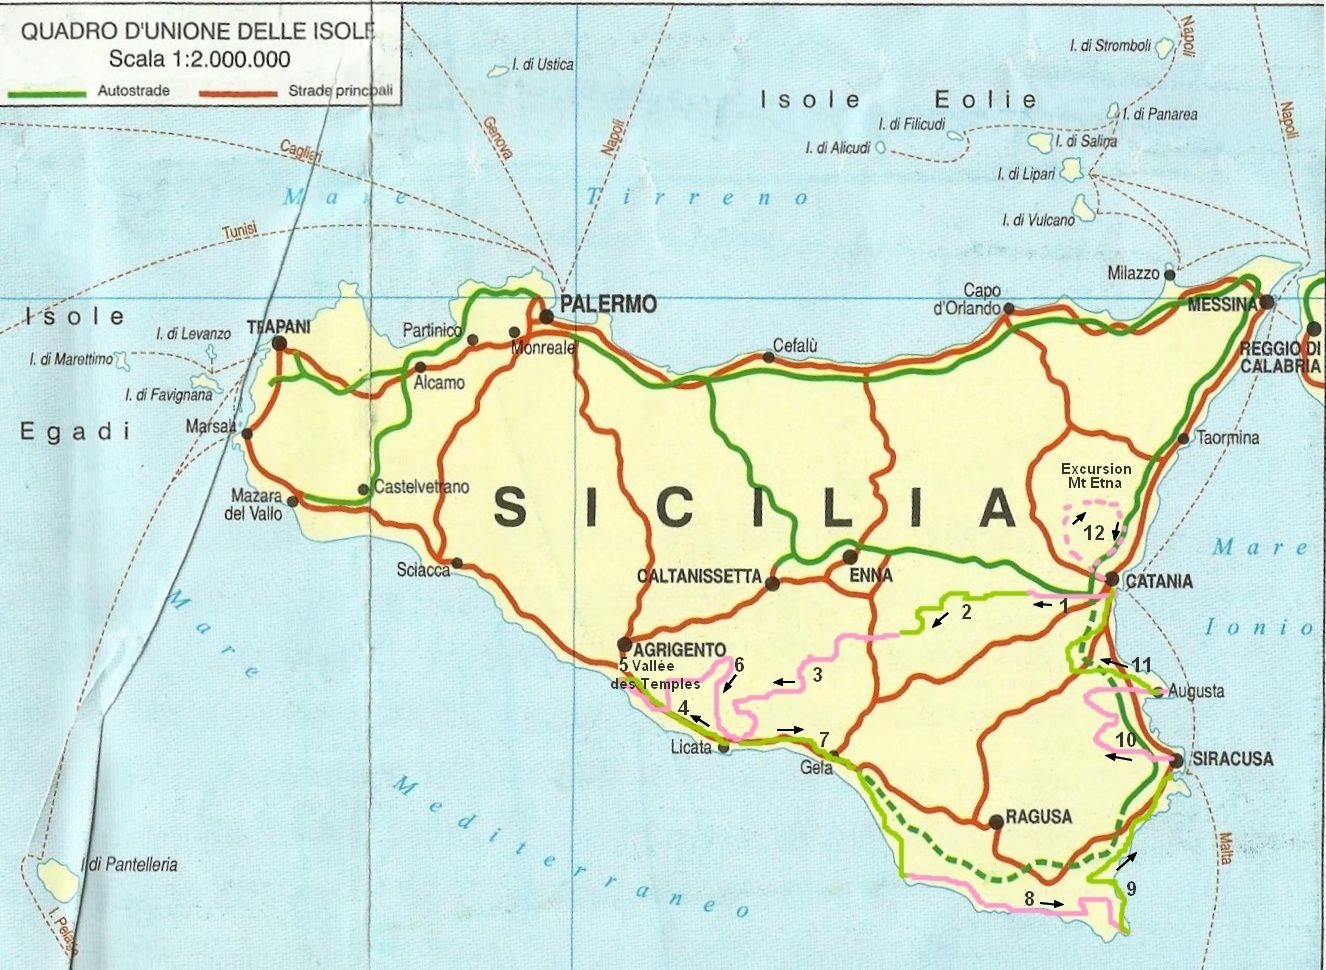 Sicile tourisme carte - Office de tourisme sicile ...